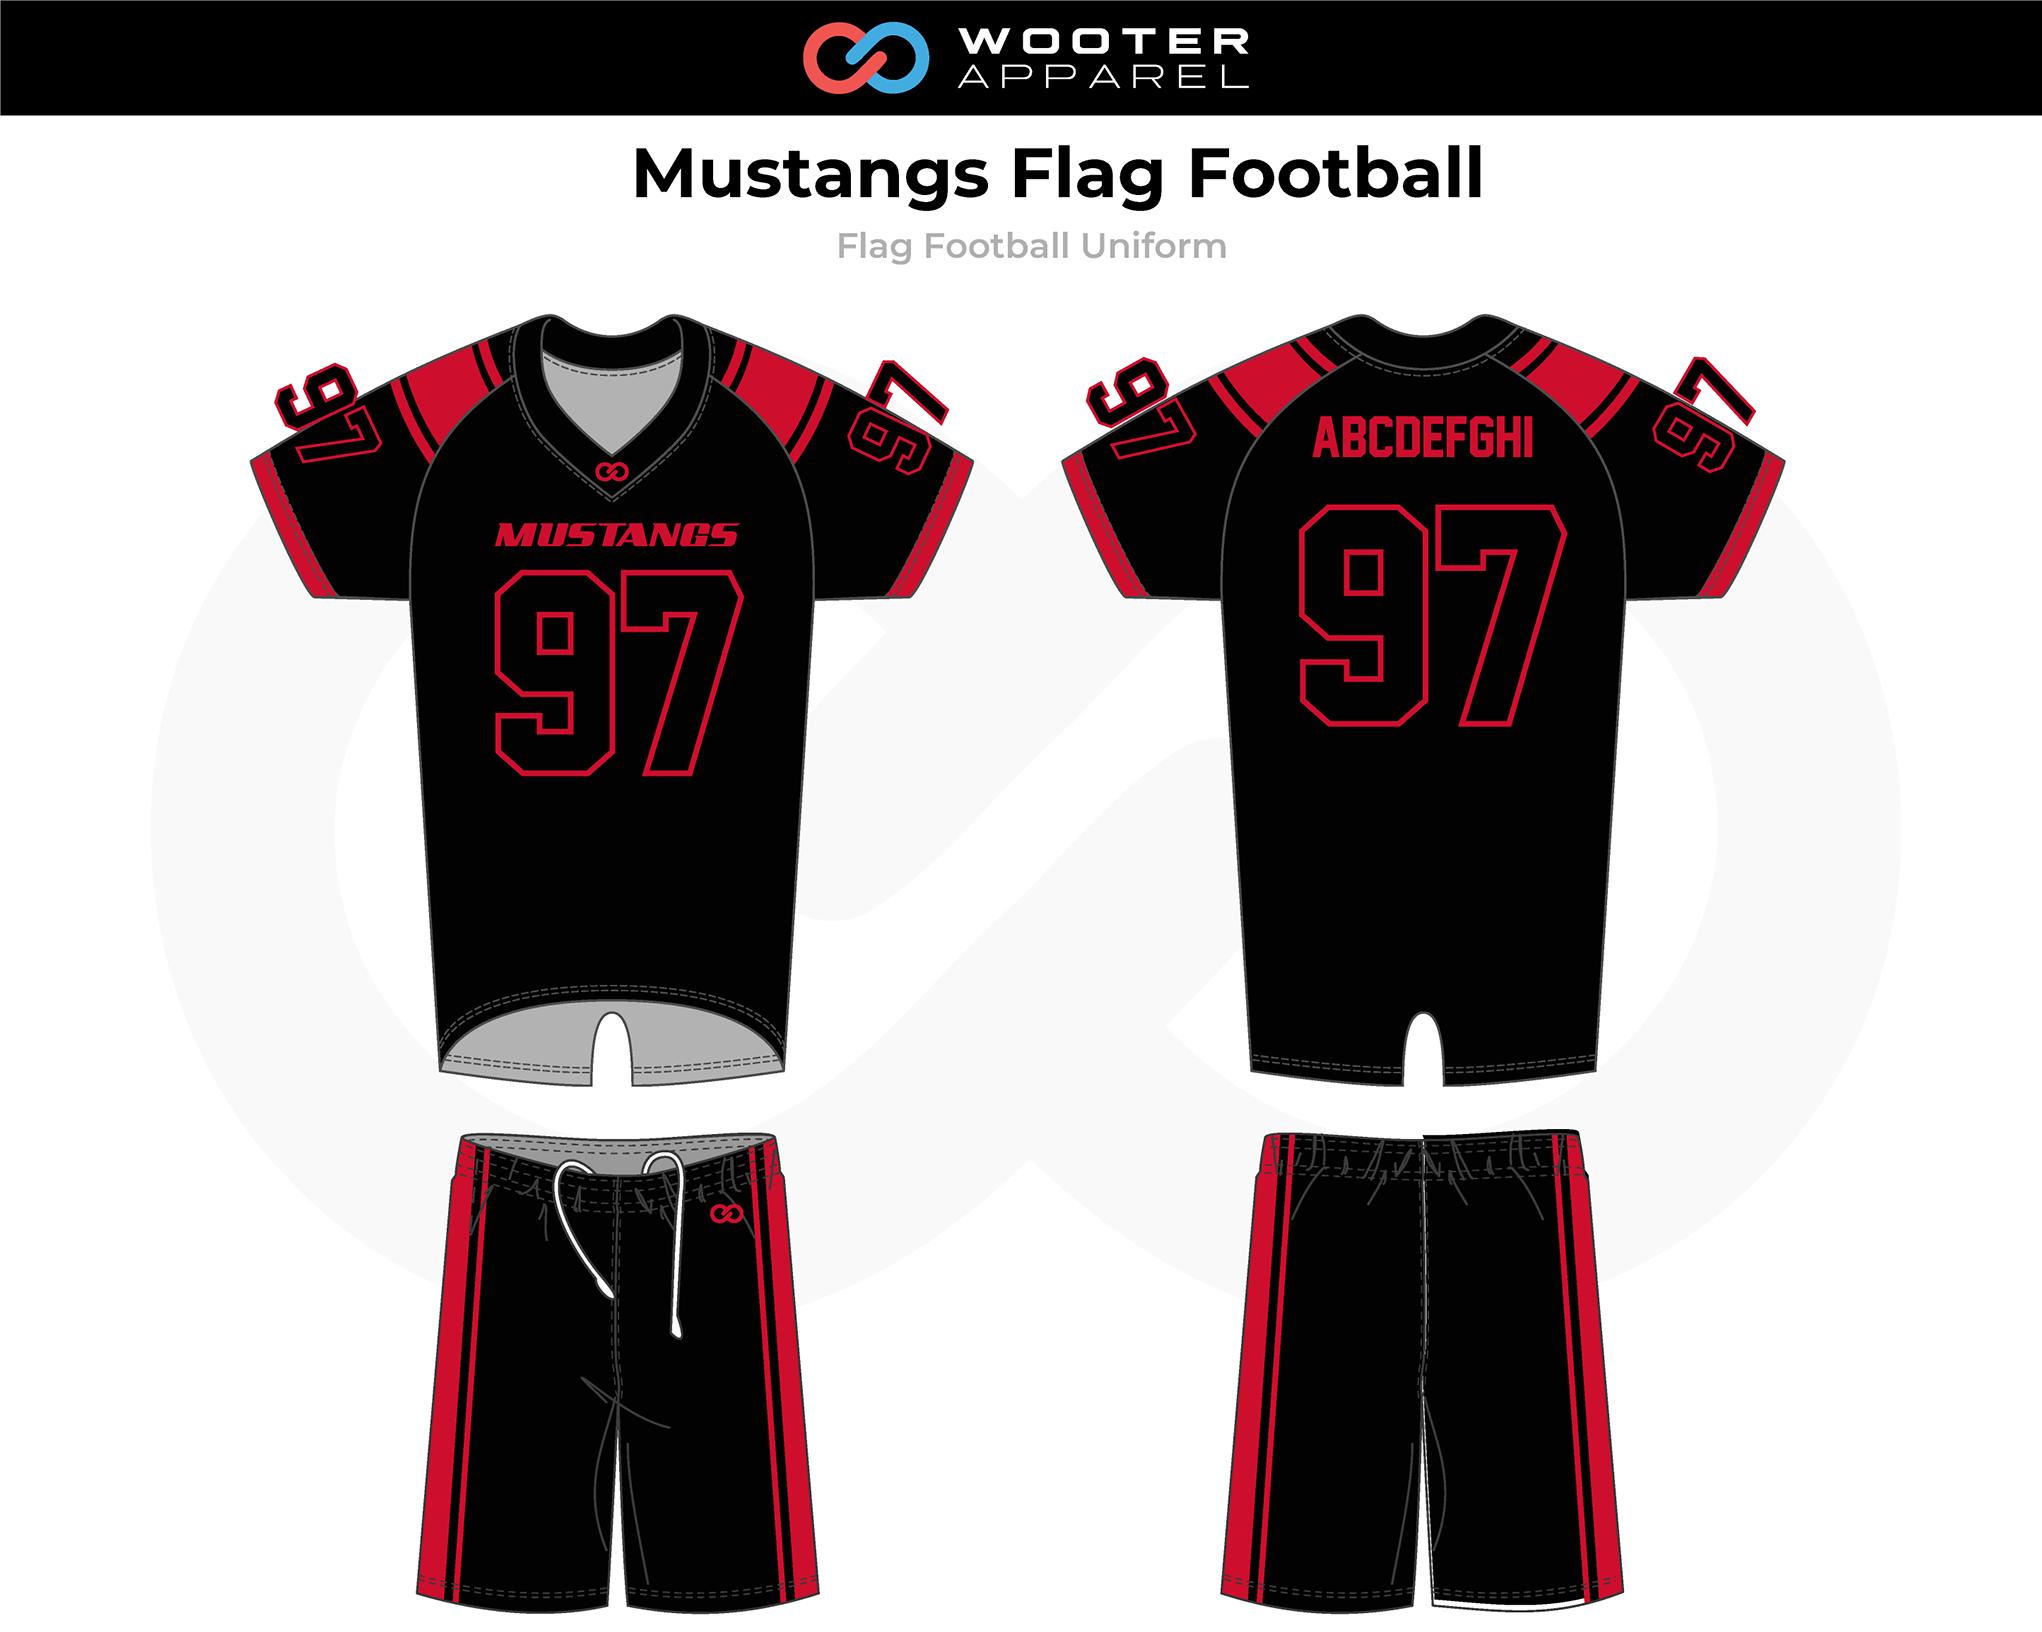 2019-02-20 Mustangs Flag Football Uniform (Stripes).png